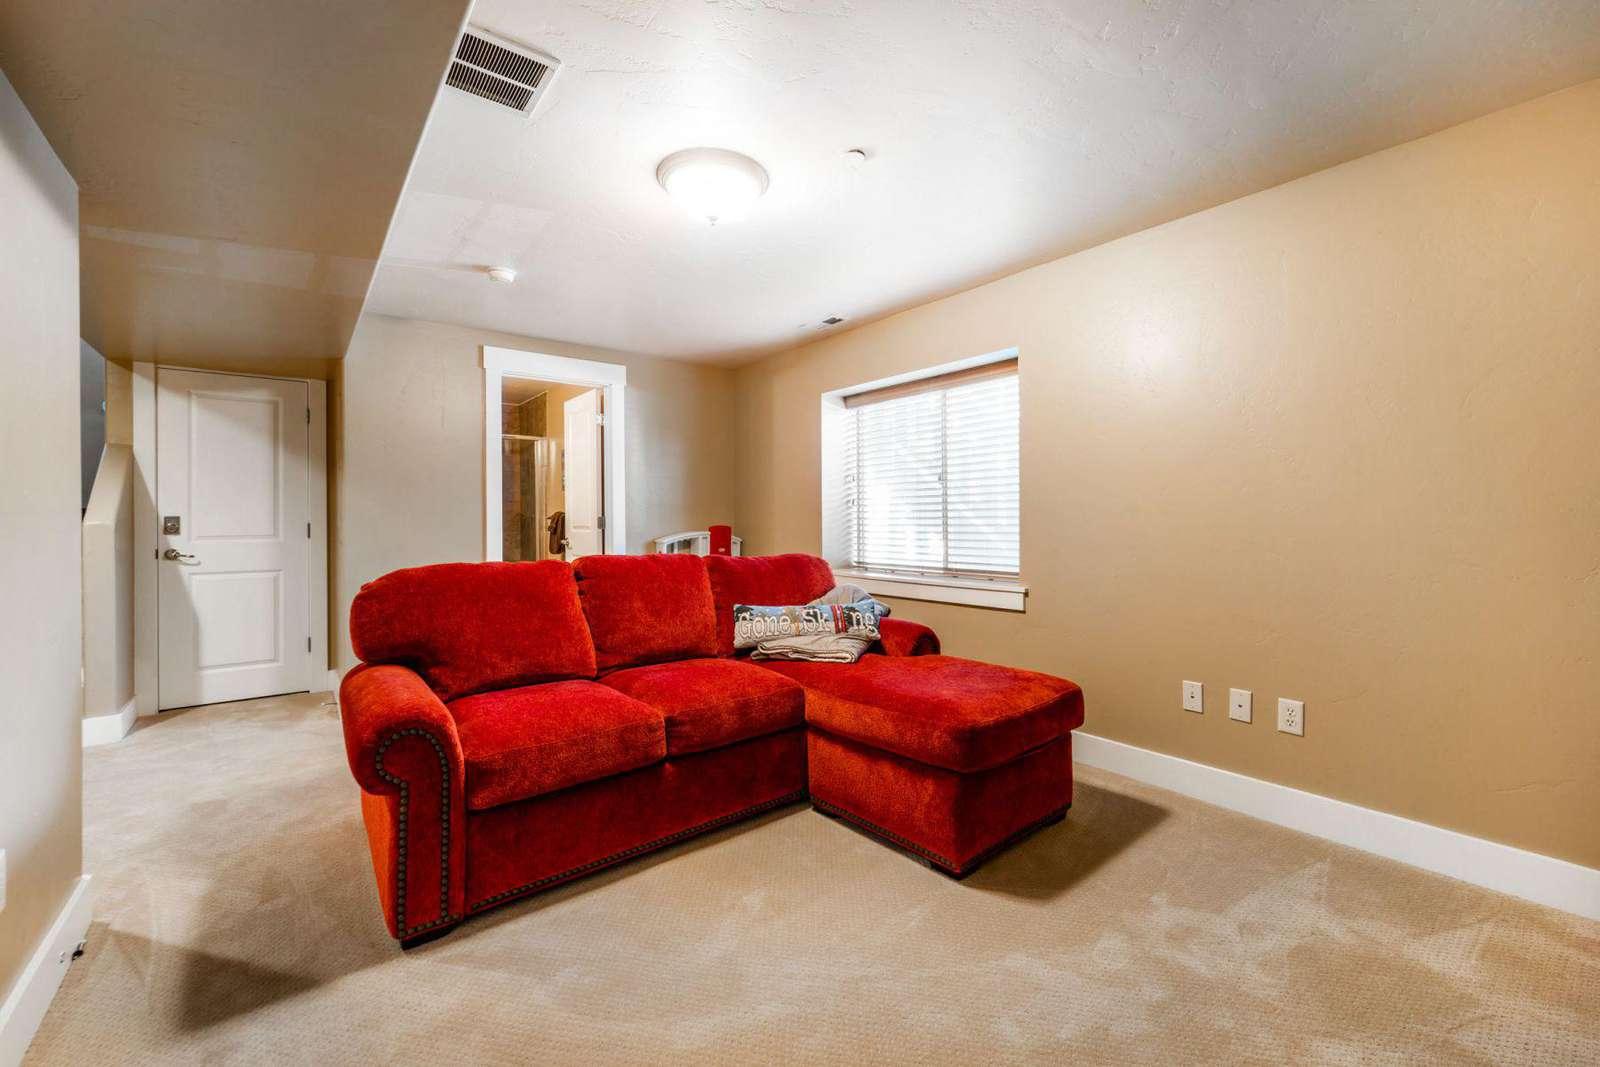 Bonus lounge room with sofa bed